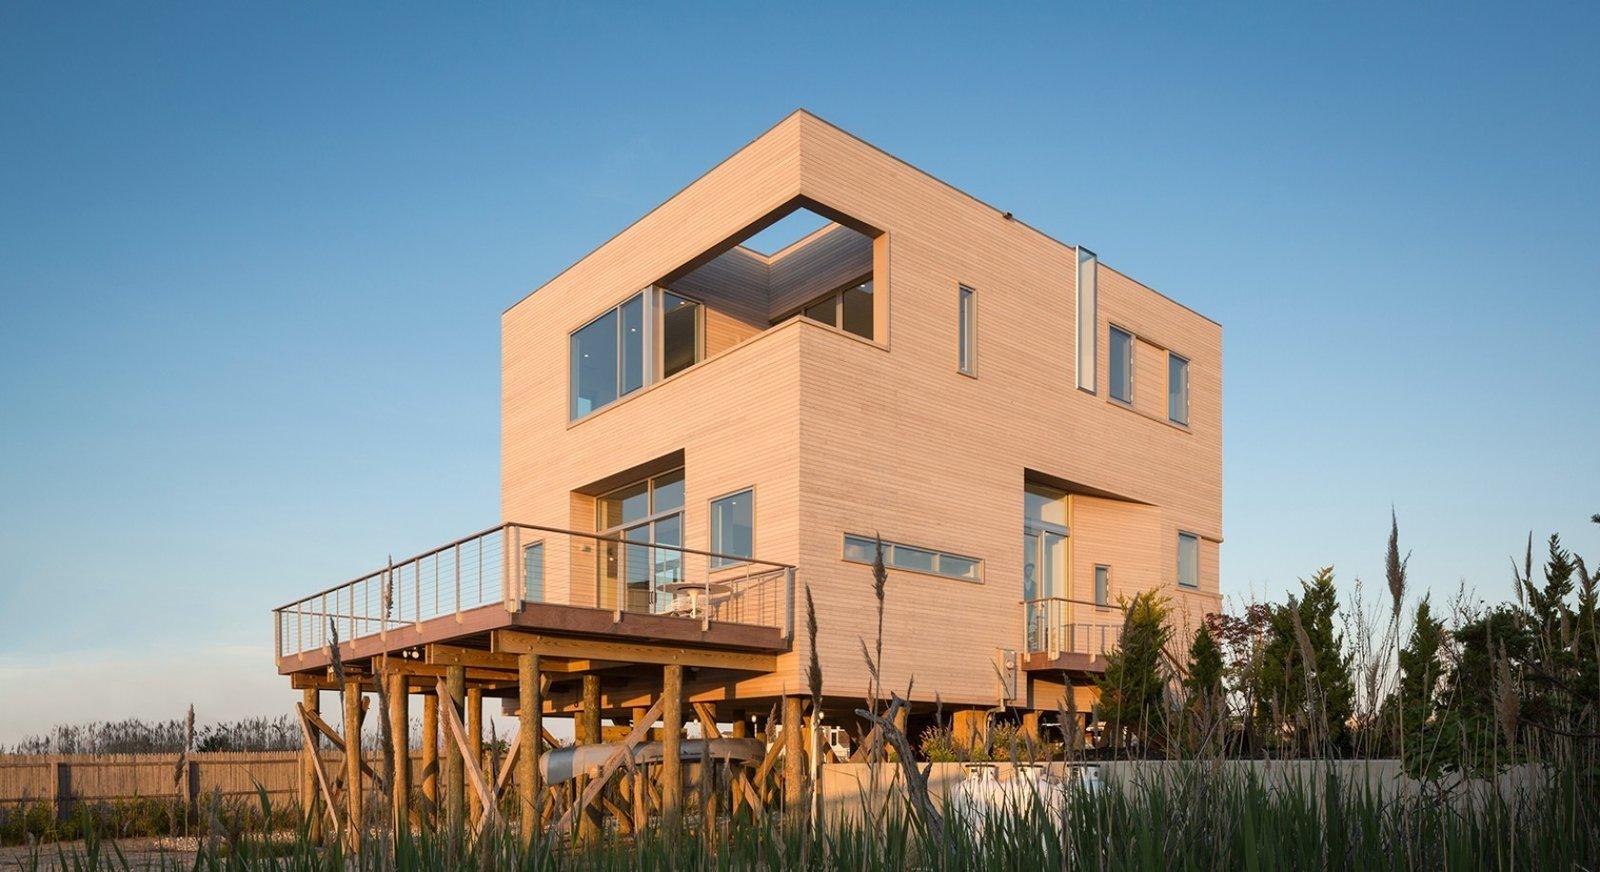 #CubeHouse #modern #cube #exterior #outside #landscape #windows #deck #timber #wetlands #cedar #retreat #privacy #dynamic #naturallighting #Westhamptonbeach #NewYork #LeroyStreetStudio